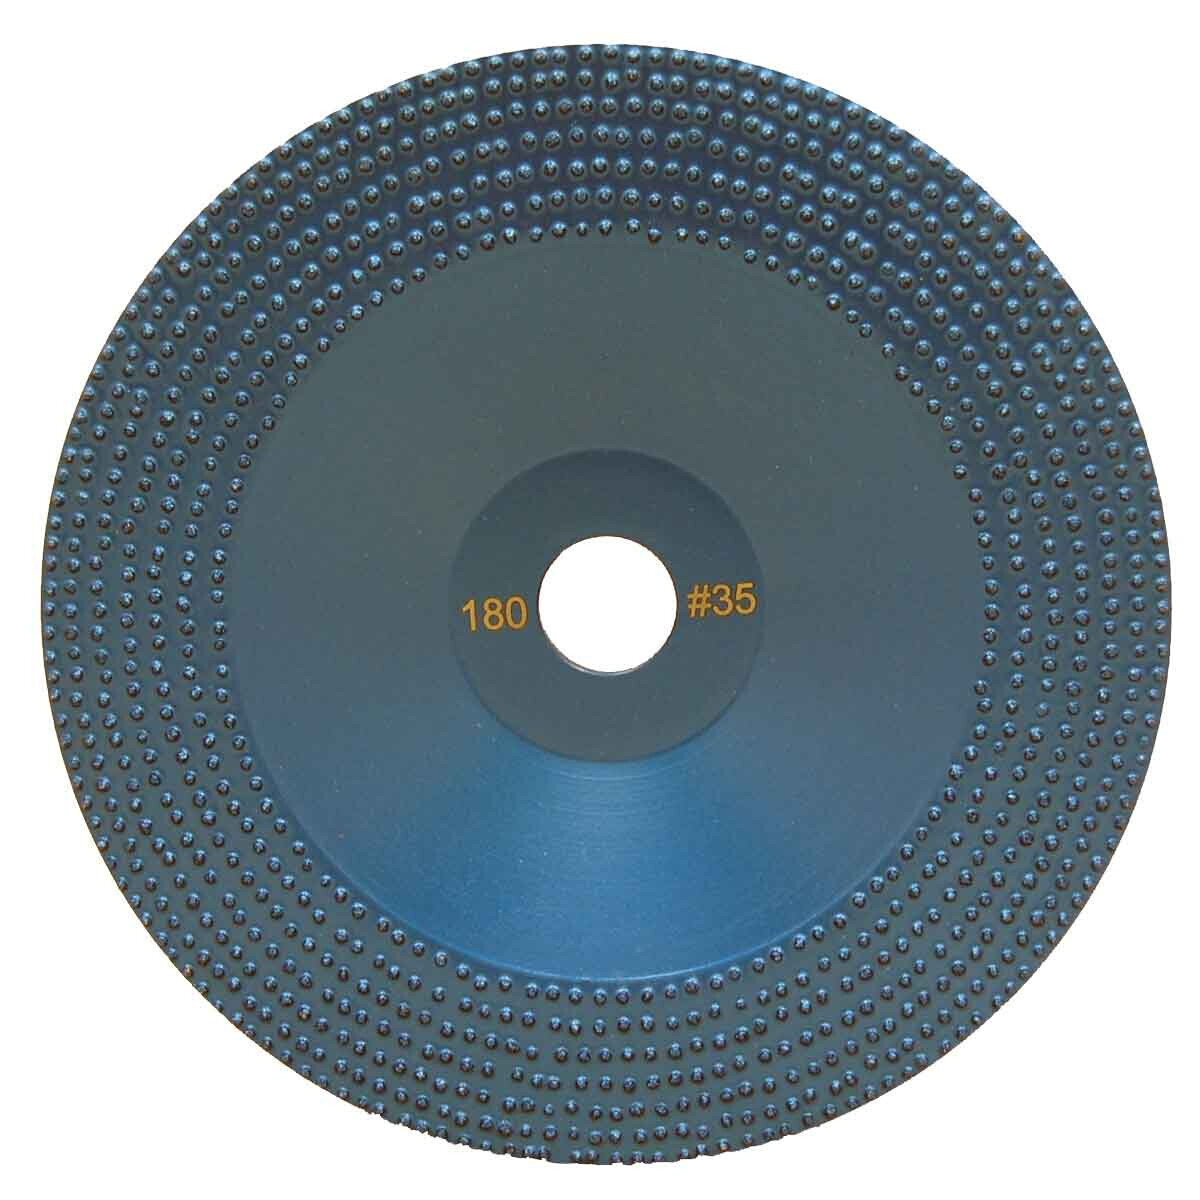 DITEQ 7 inch Vacuum Brazed Spike Disc - 35 Grit